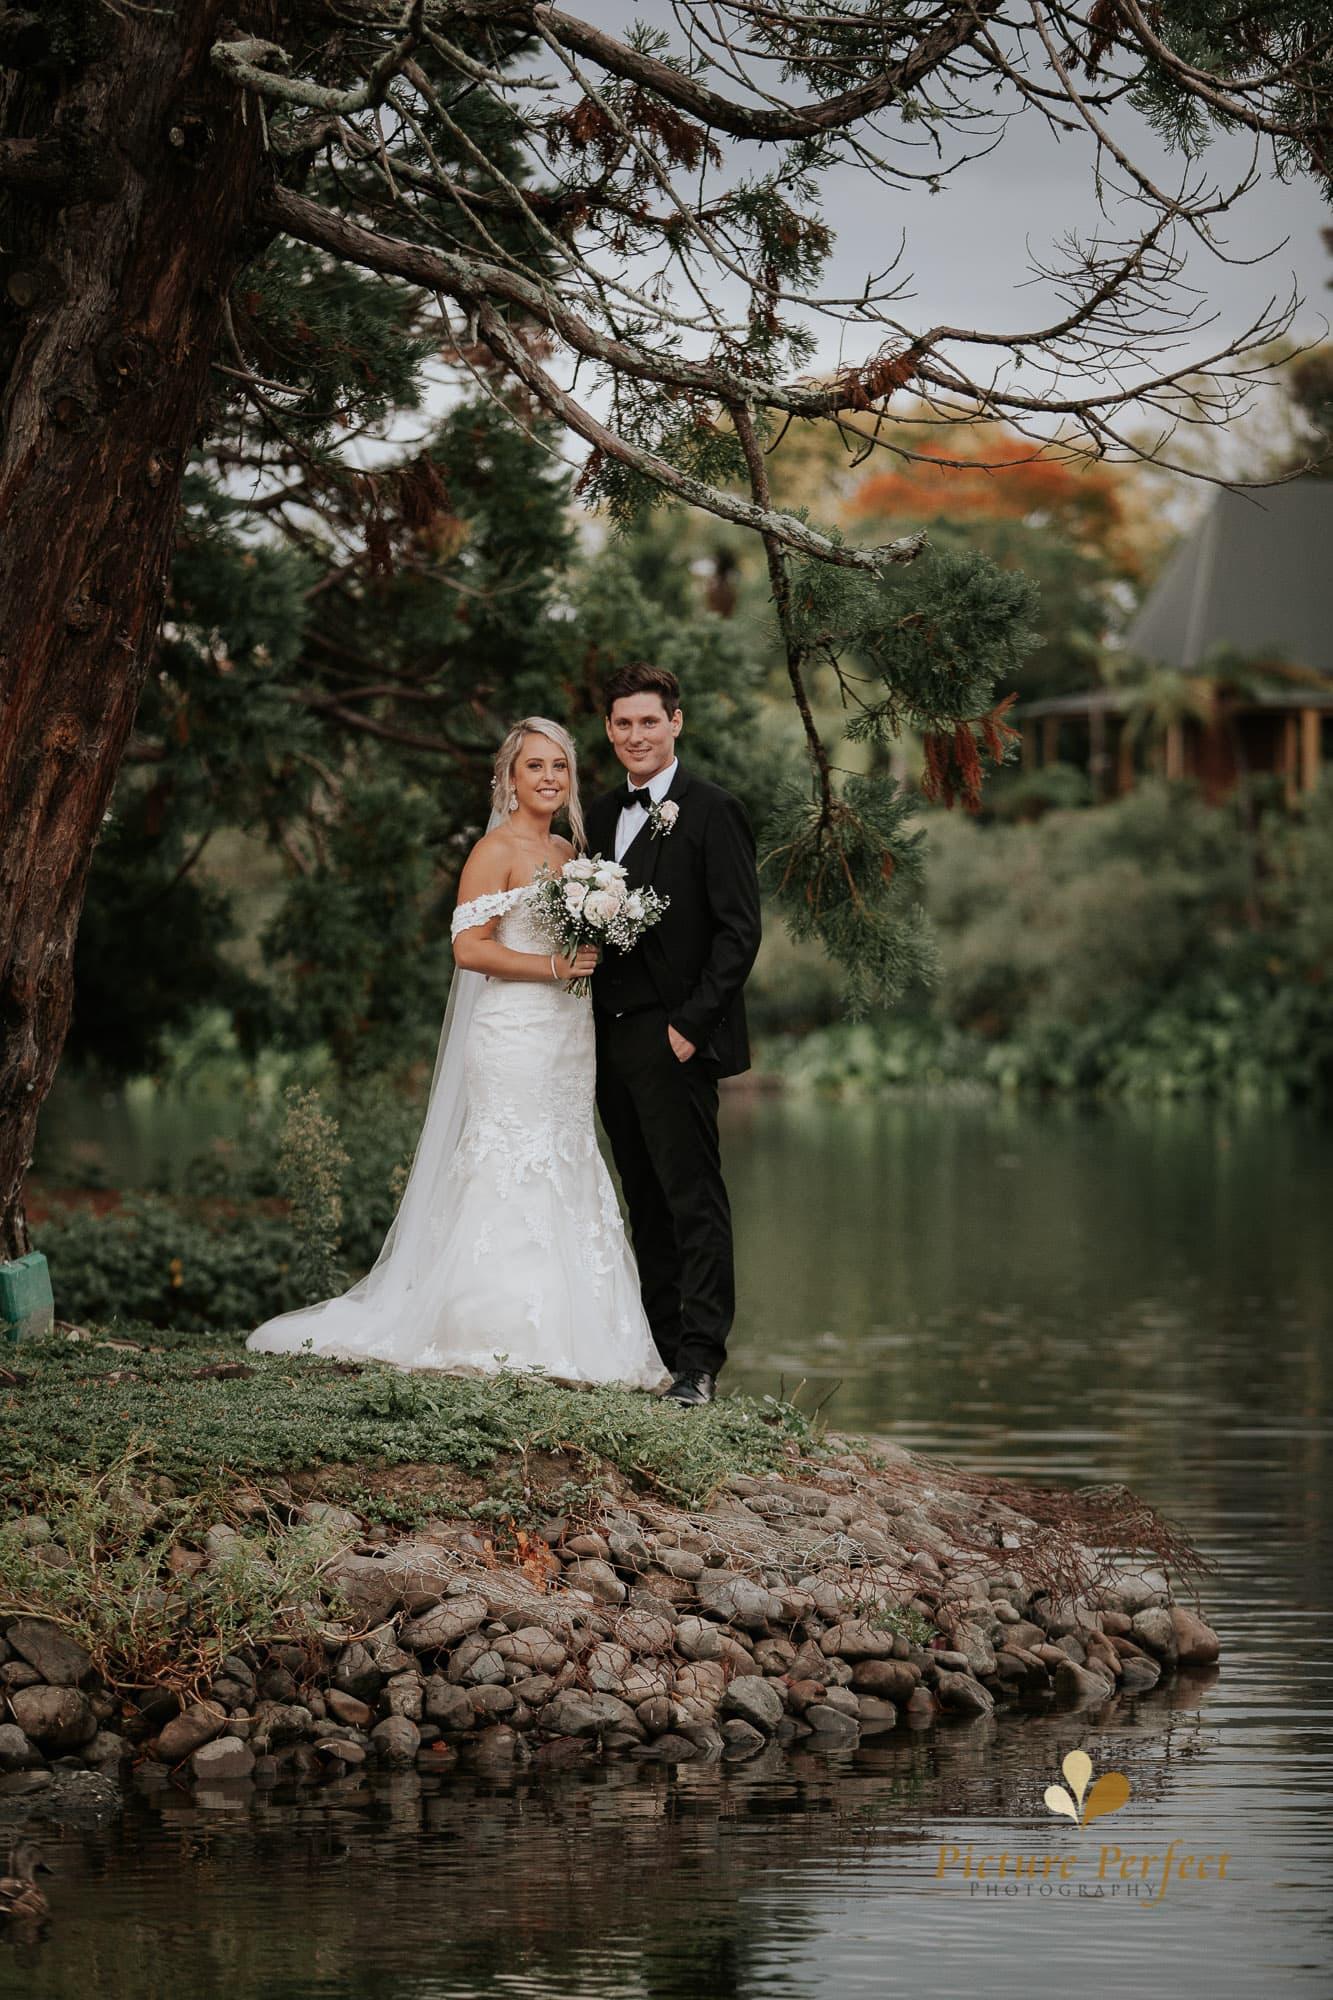 Manawatu wedding photography Danielle 0169